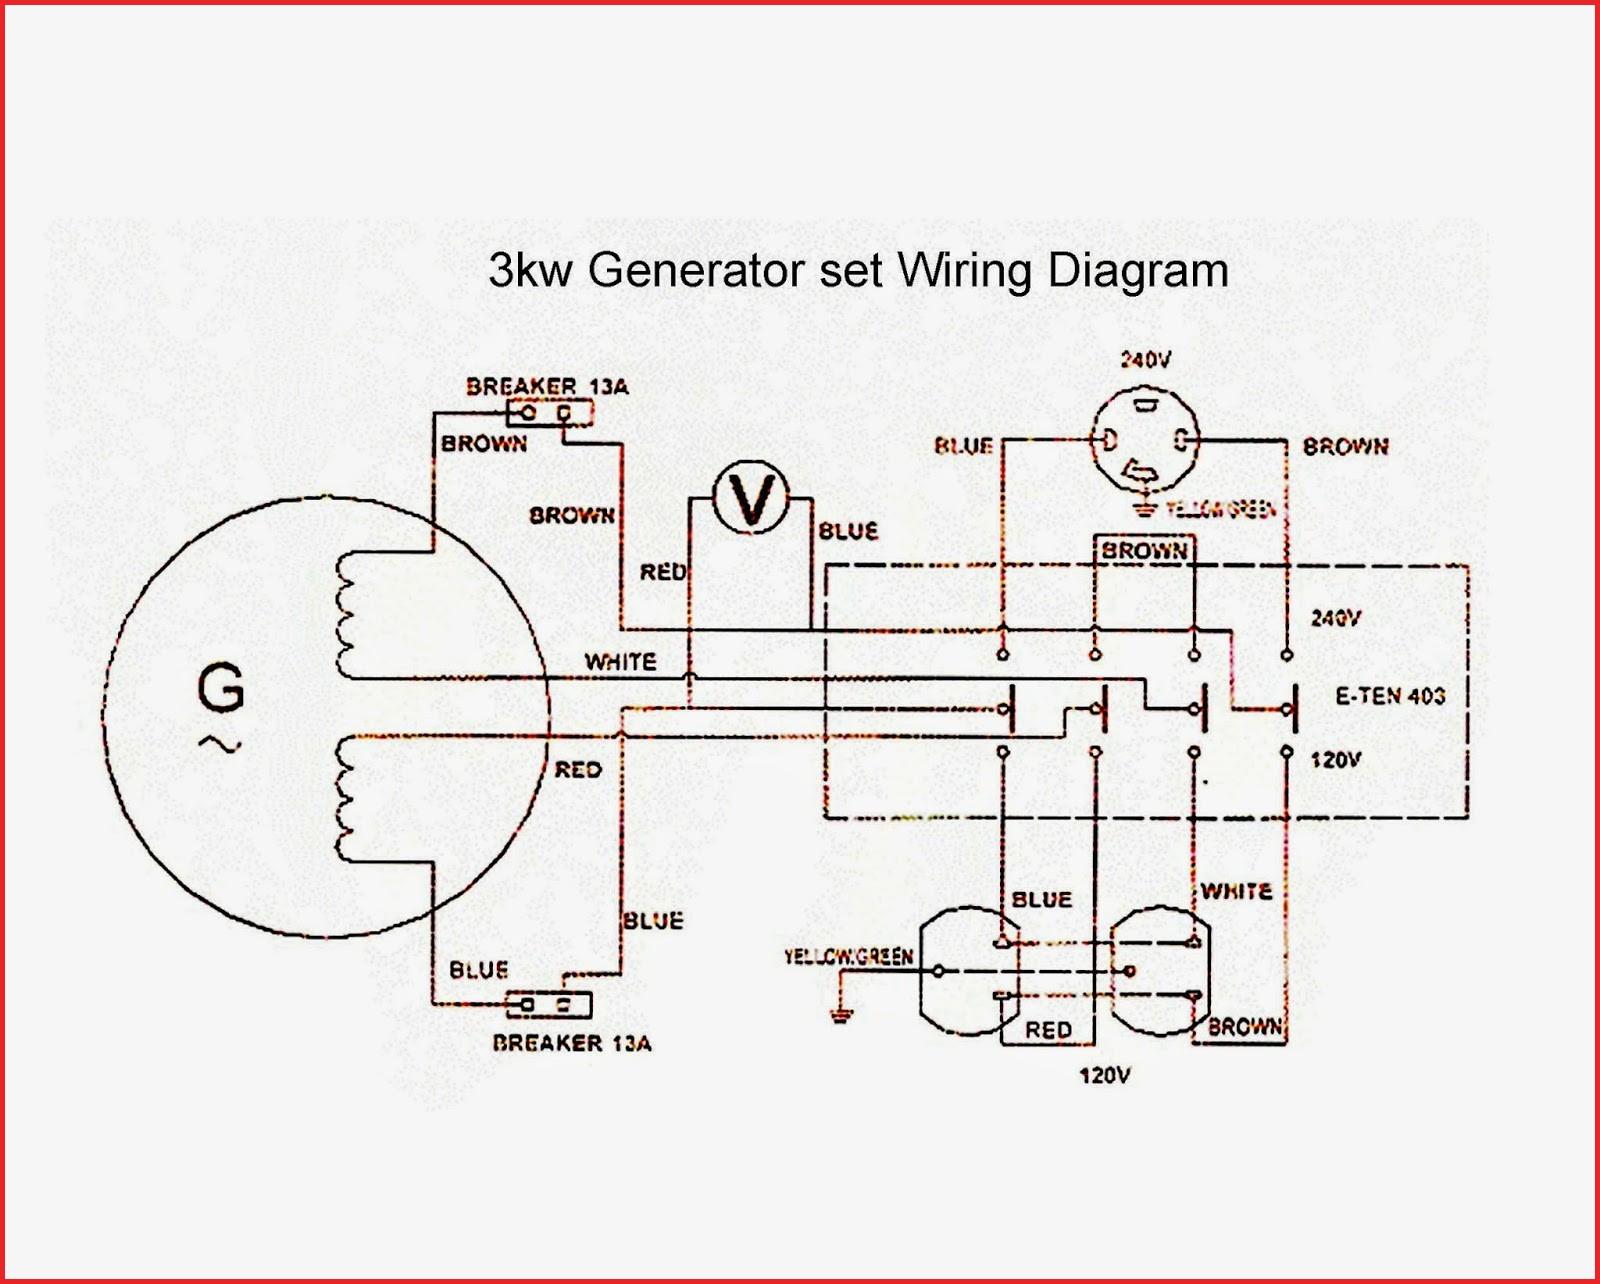 Wiring Diagram Creator - All Wiring Diagram Data - Wiring Diagram Creator